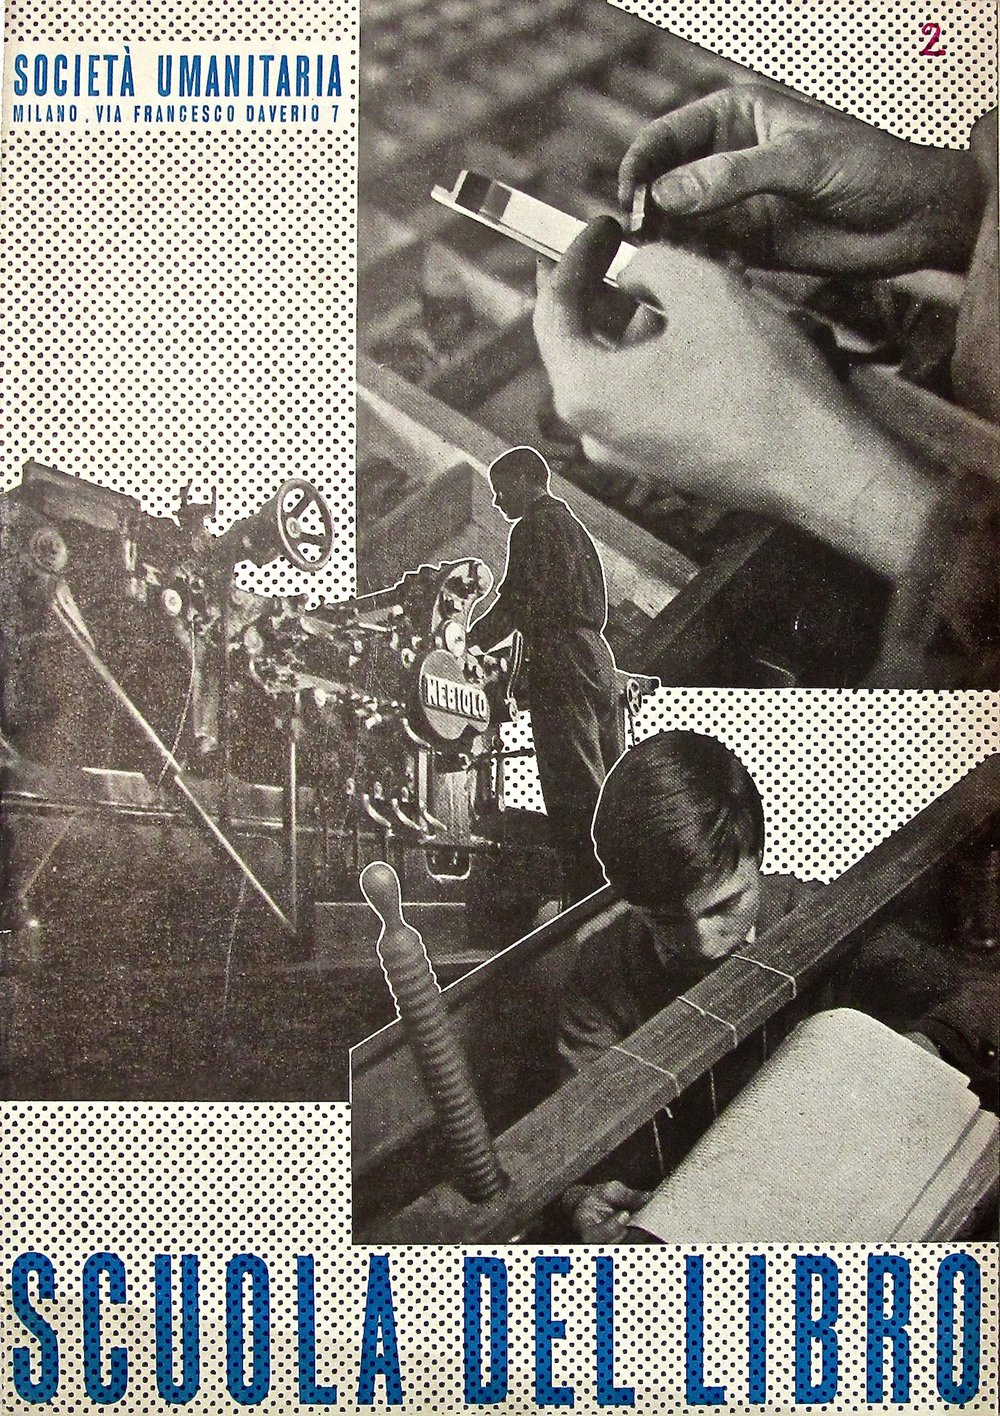 promotional pamphlet, Scuola del Libro in Milan